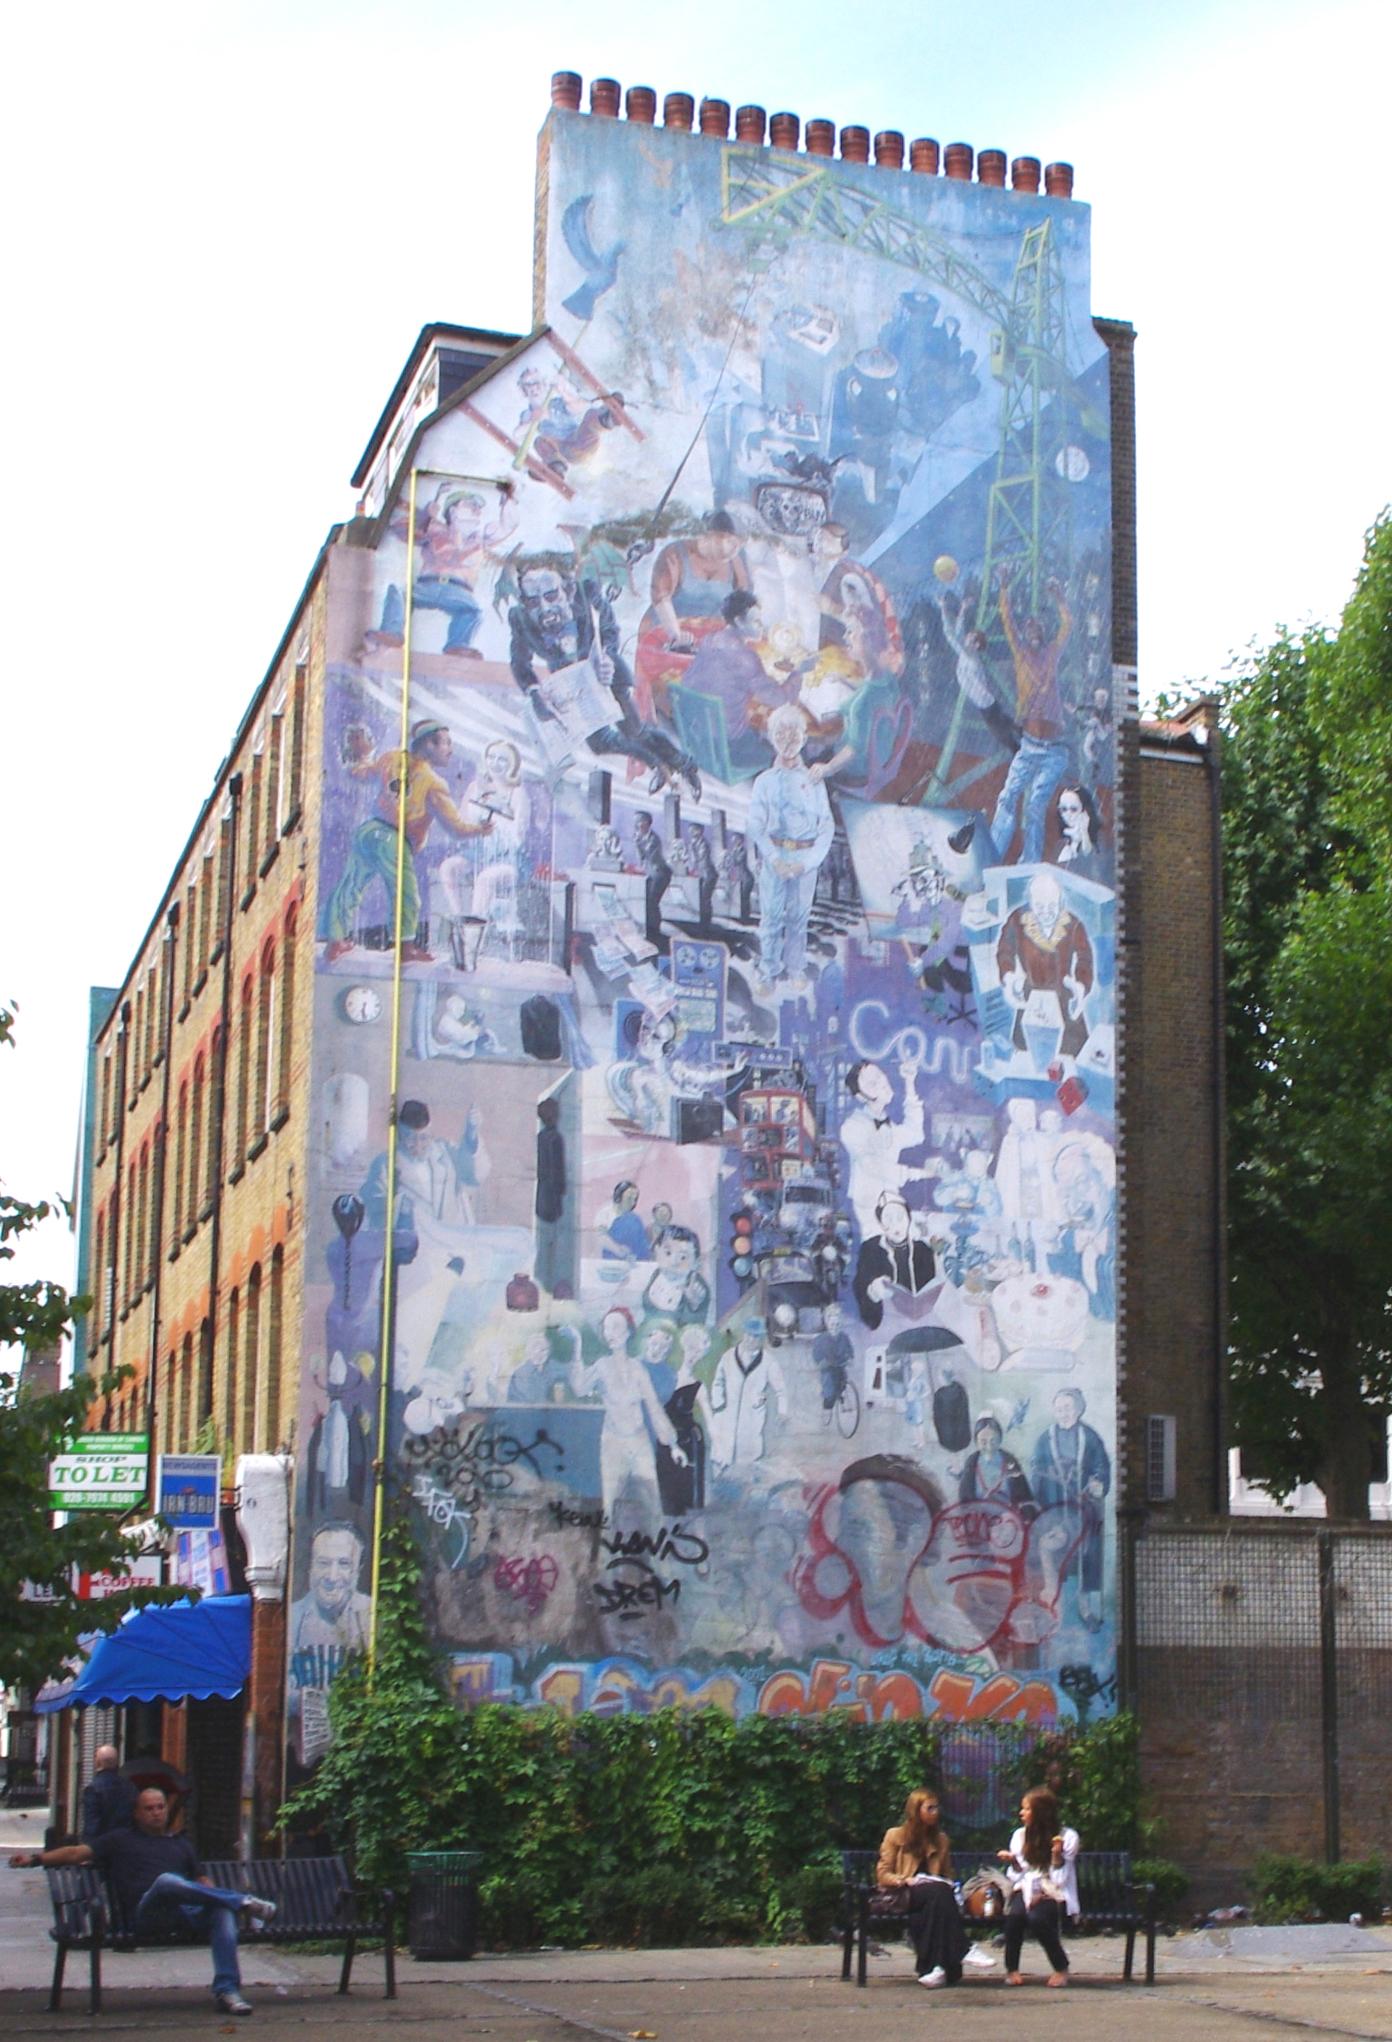 Fitzrovia Mural at Whitfield Gardens, Tottenham Court Road